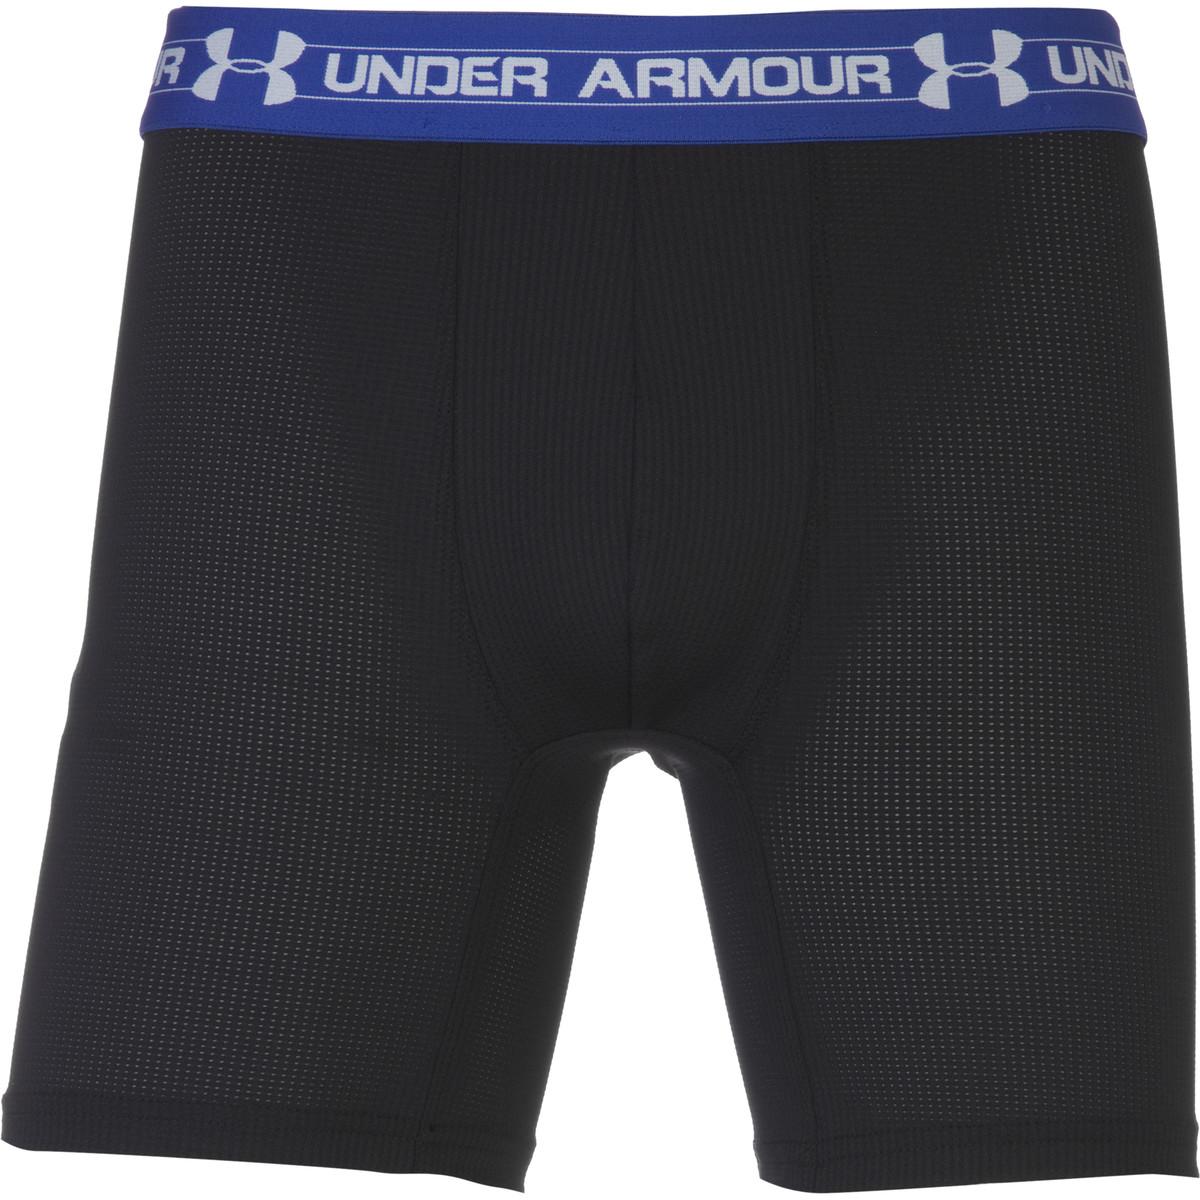 "Under Armour Mesh 6"" Boxerjock"